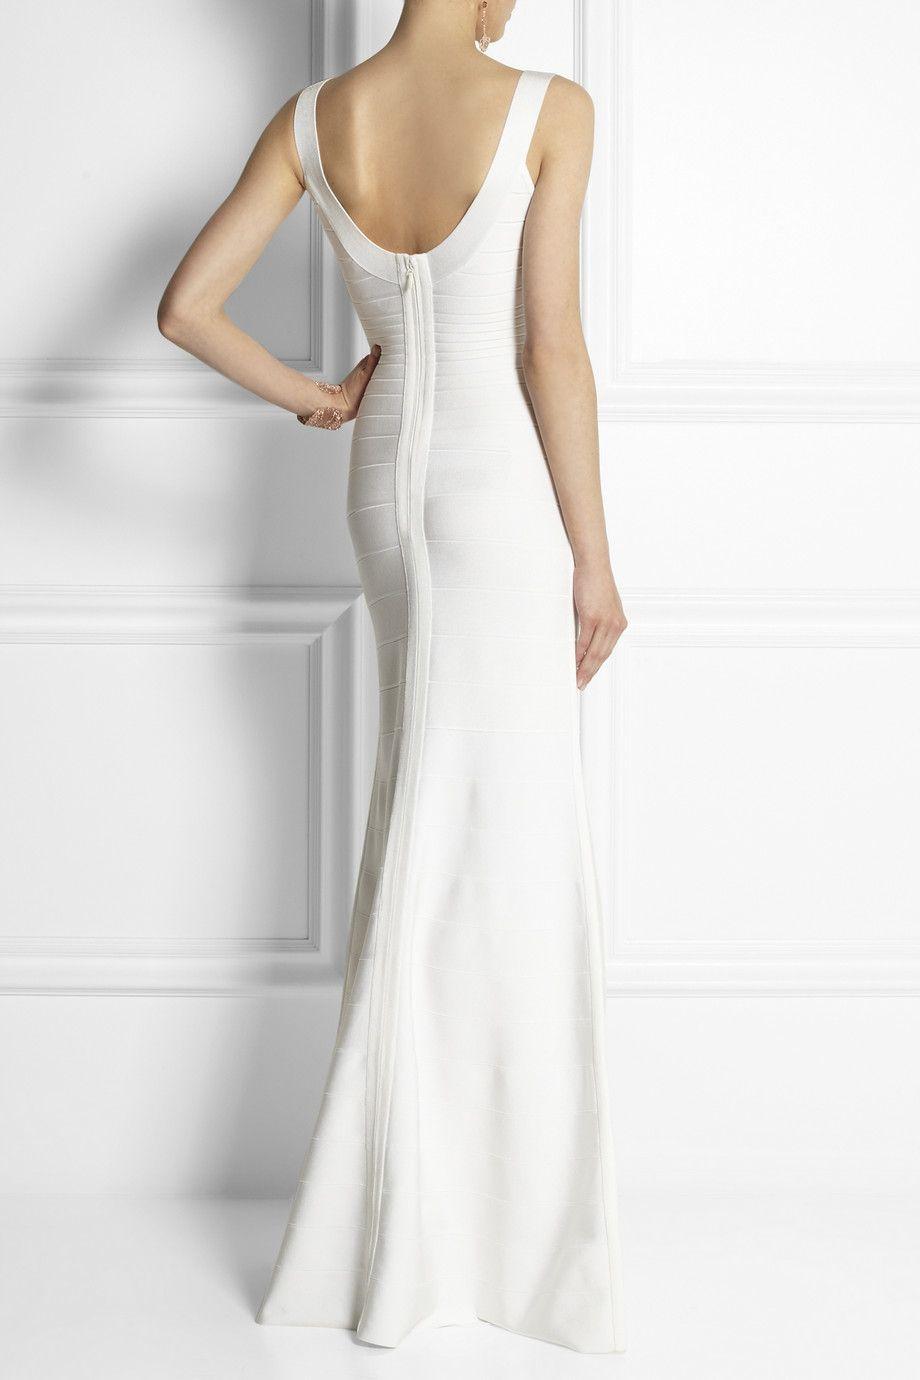 Herve leger white long bandage dress pic madame pinterest